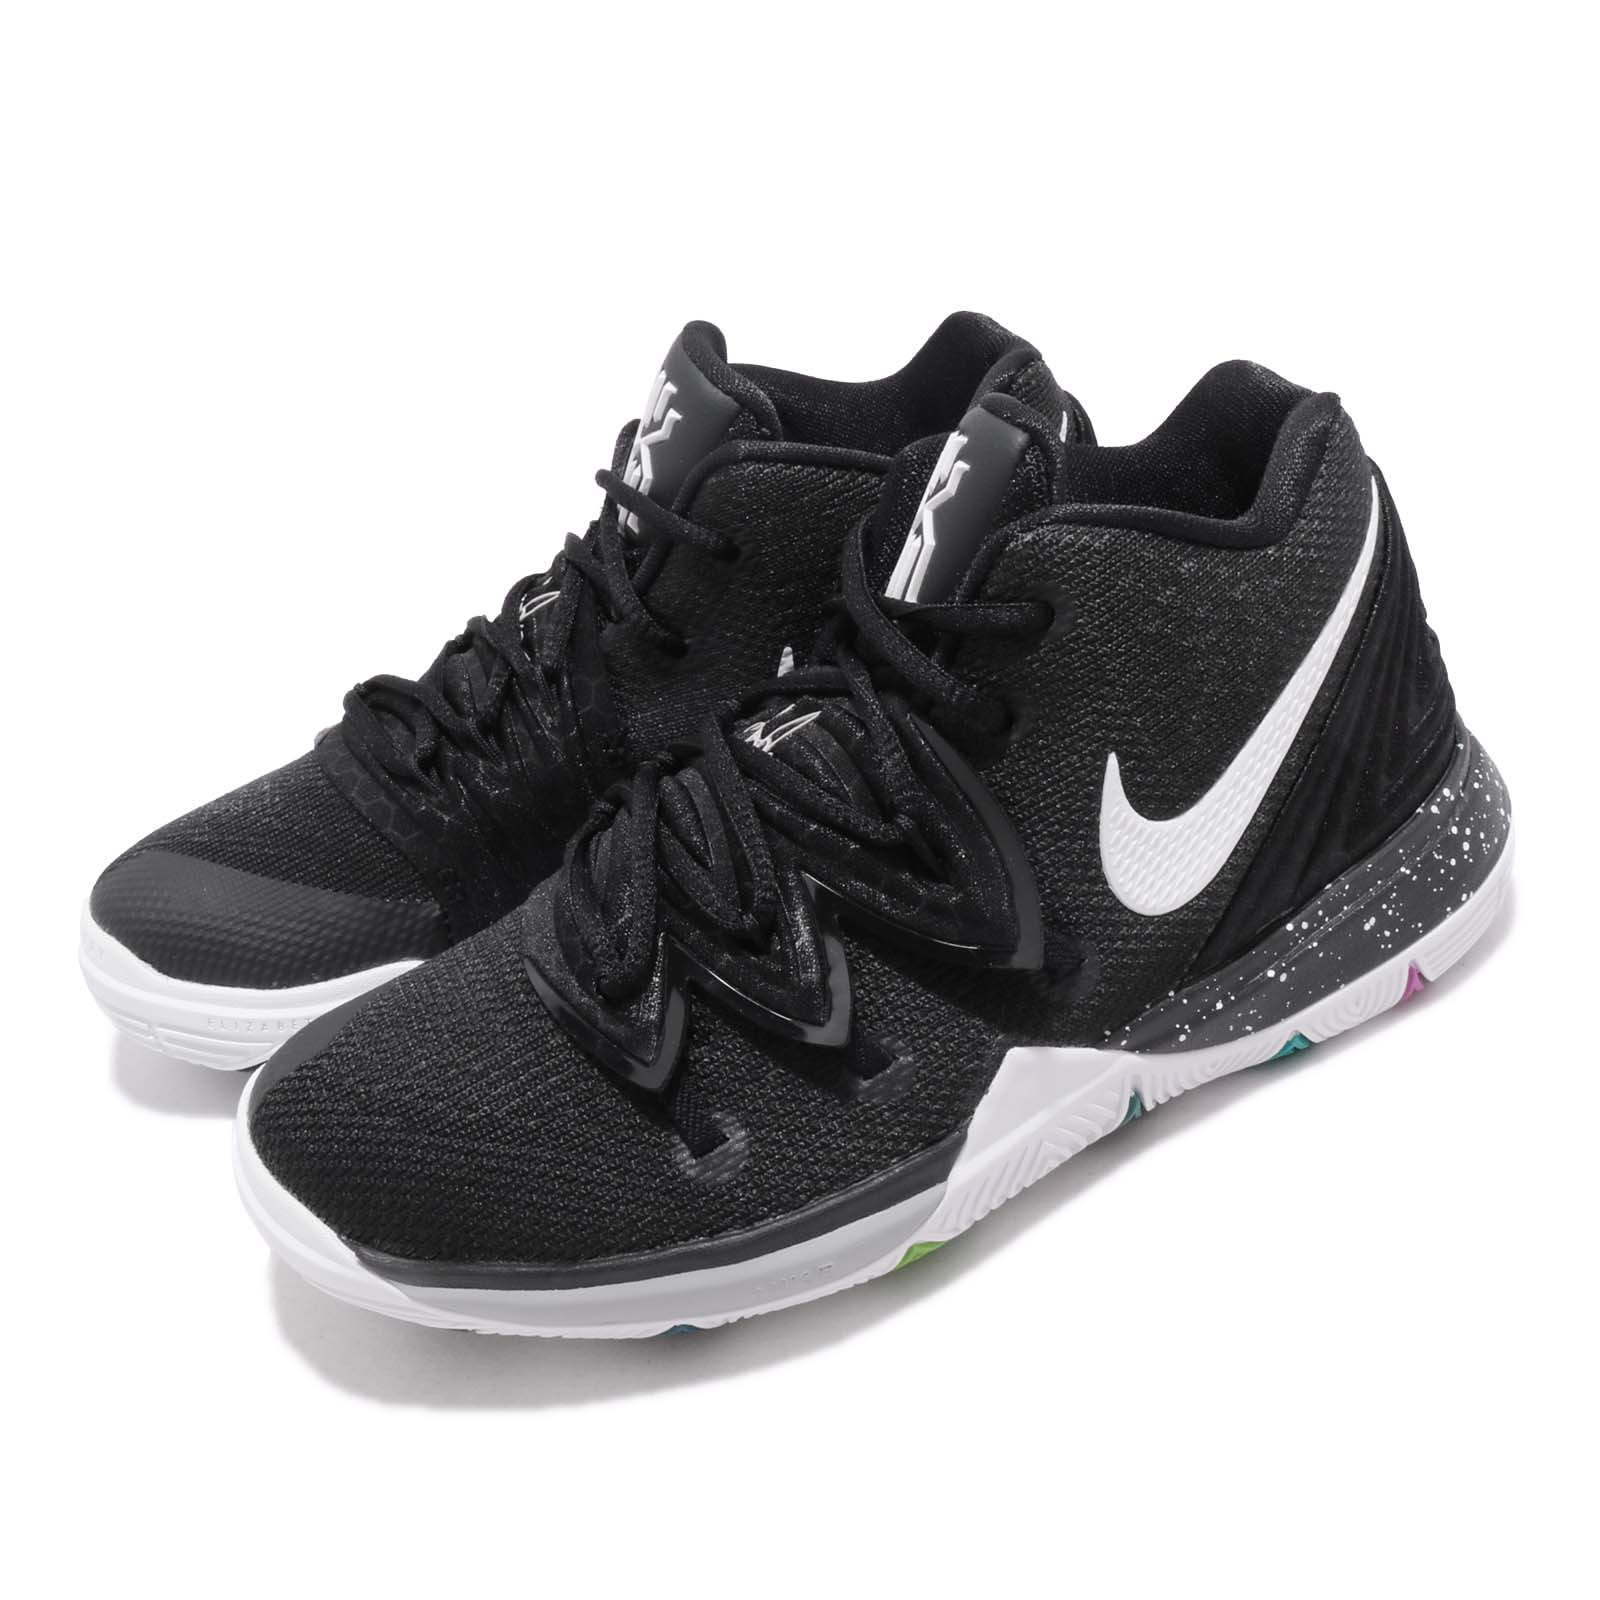 Nike 籃球鞋 Kyrie 5 PS 運動 童鞋 AQ2458-901